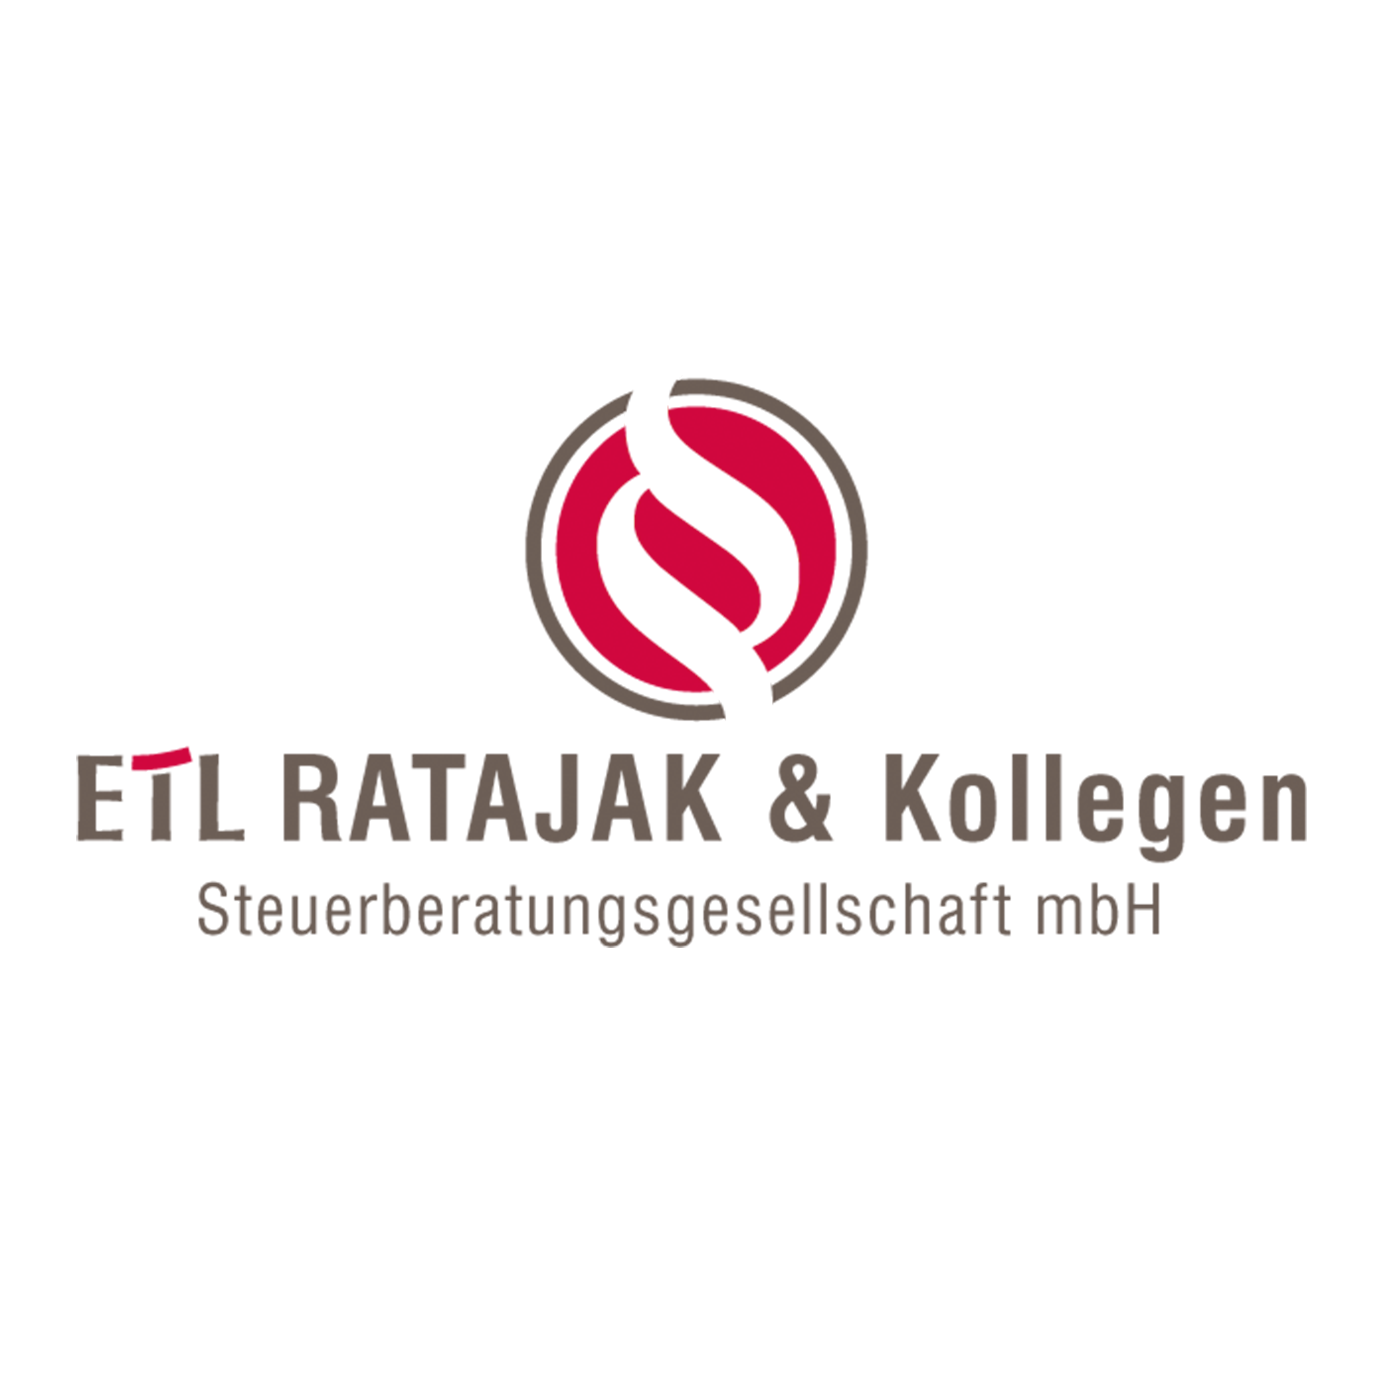 Bild zu ETL RATAJAK & Kollegen Steuerberatungsgesellschaft mbH in München